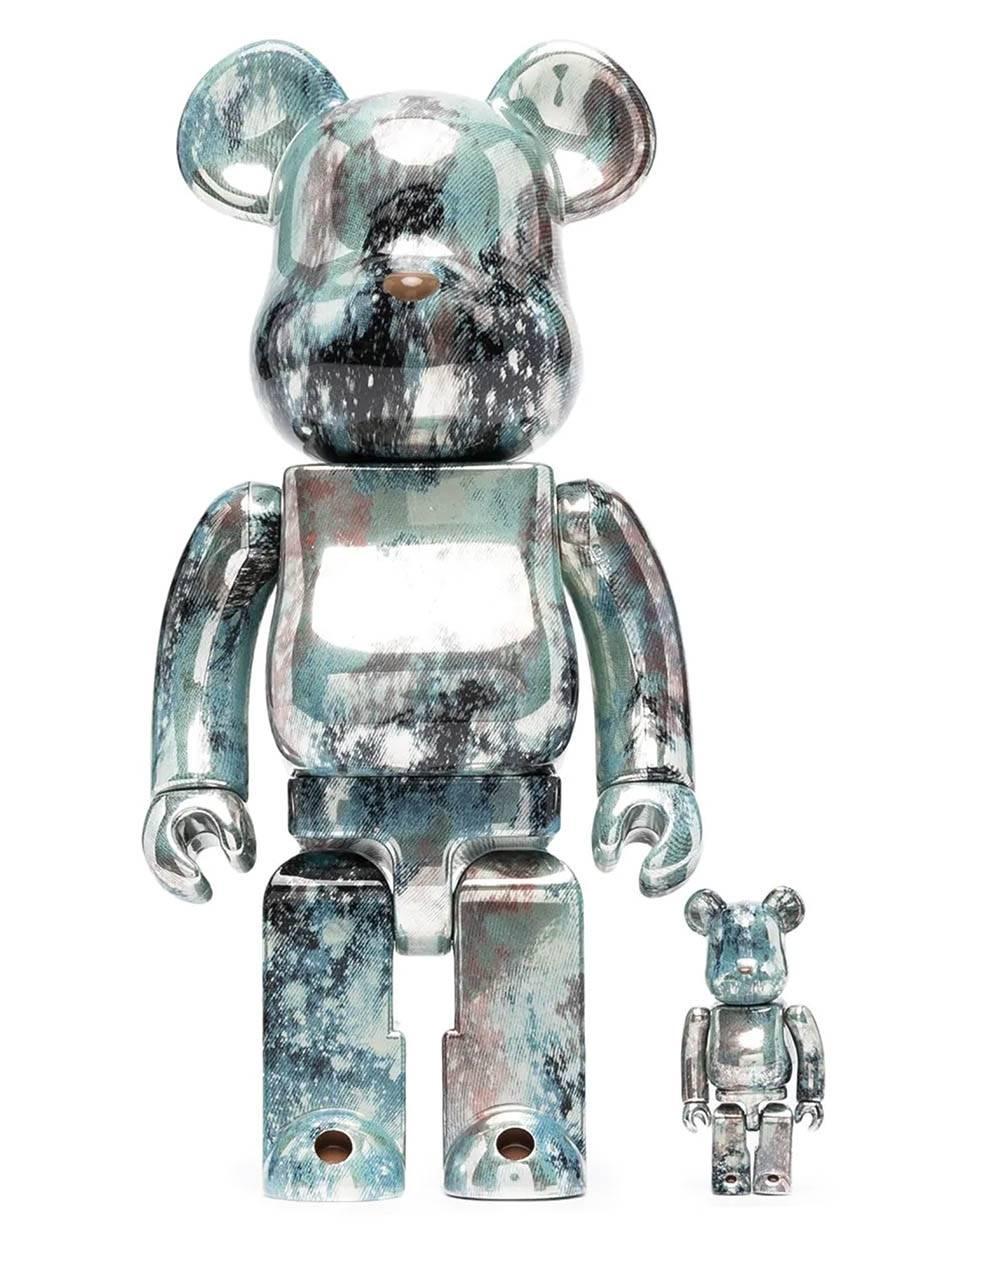 Medicom Toy Pushead 5 Bearbrick Set 100% 400% Medicom Toy Toys 229,51€